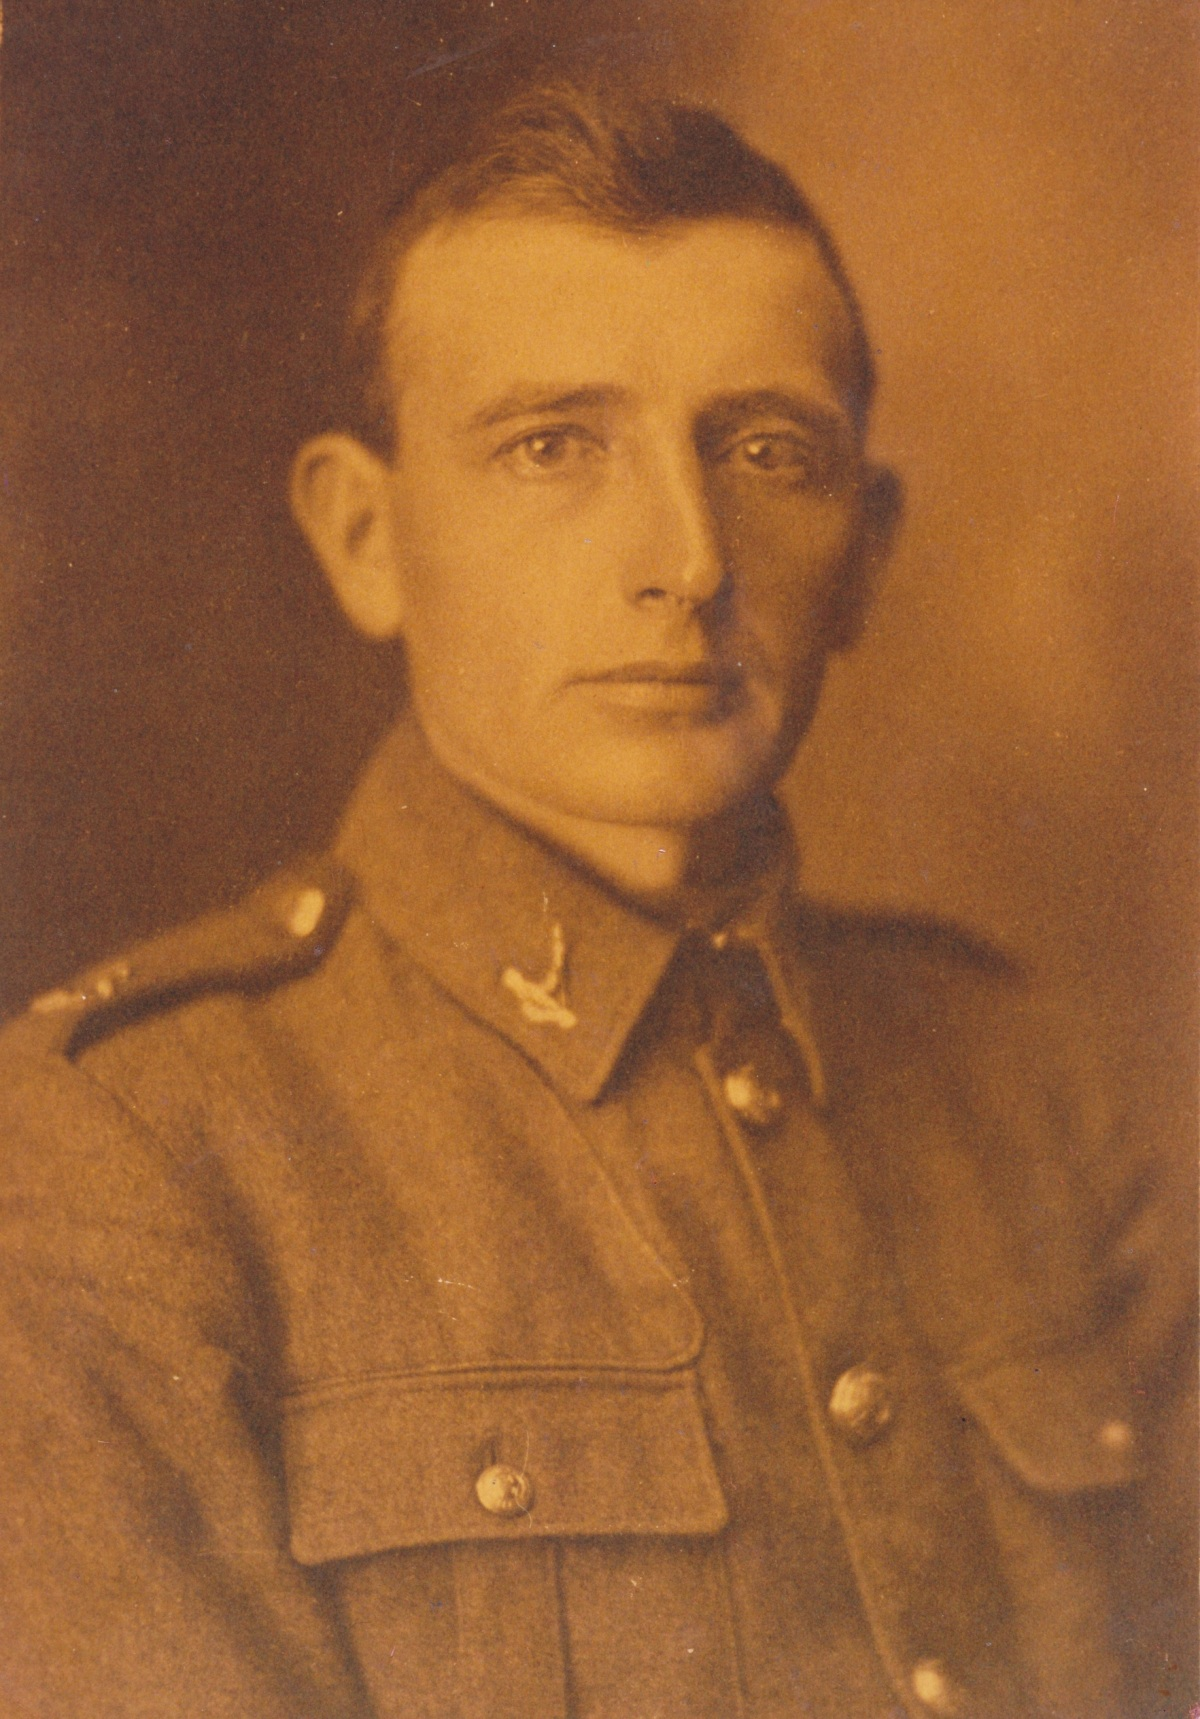 Thomas Alexander Gillanders (8 April 1881 - 25 April 1915)